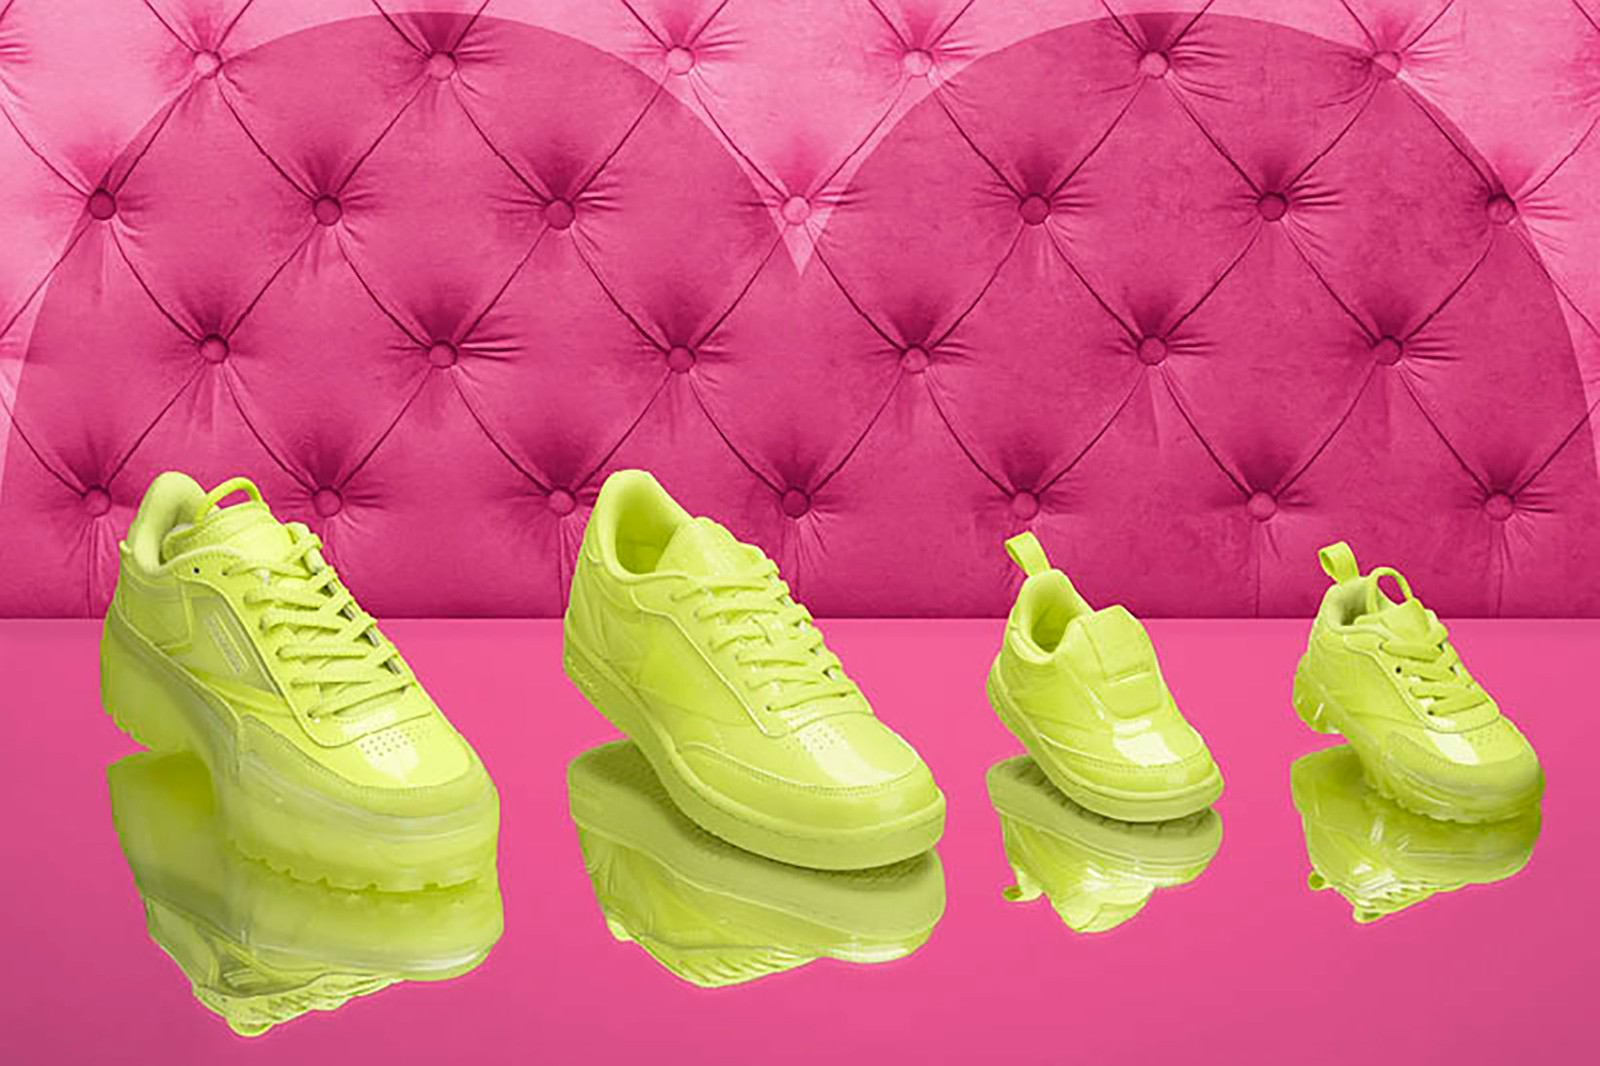 cardi b reebok coated club c double collaboration sneakers neon pink green footwear shoes sneakerhead